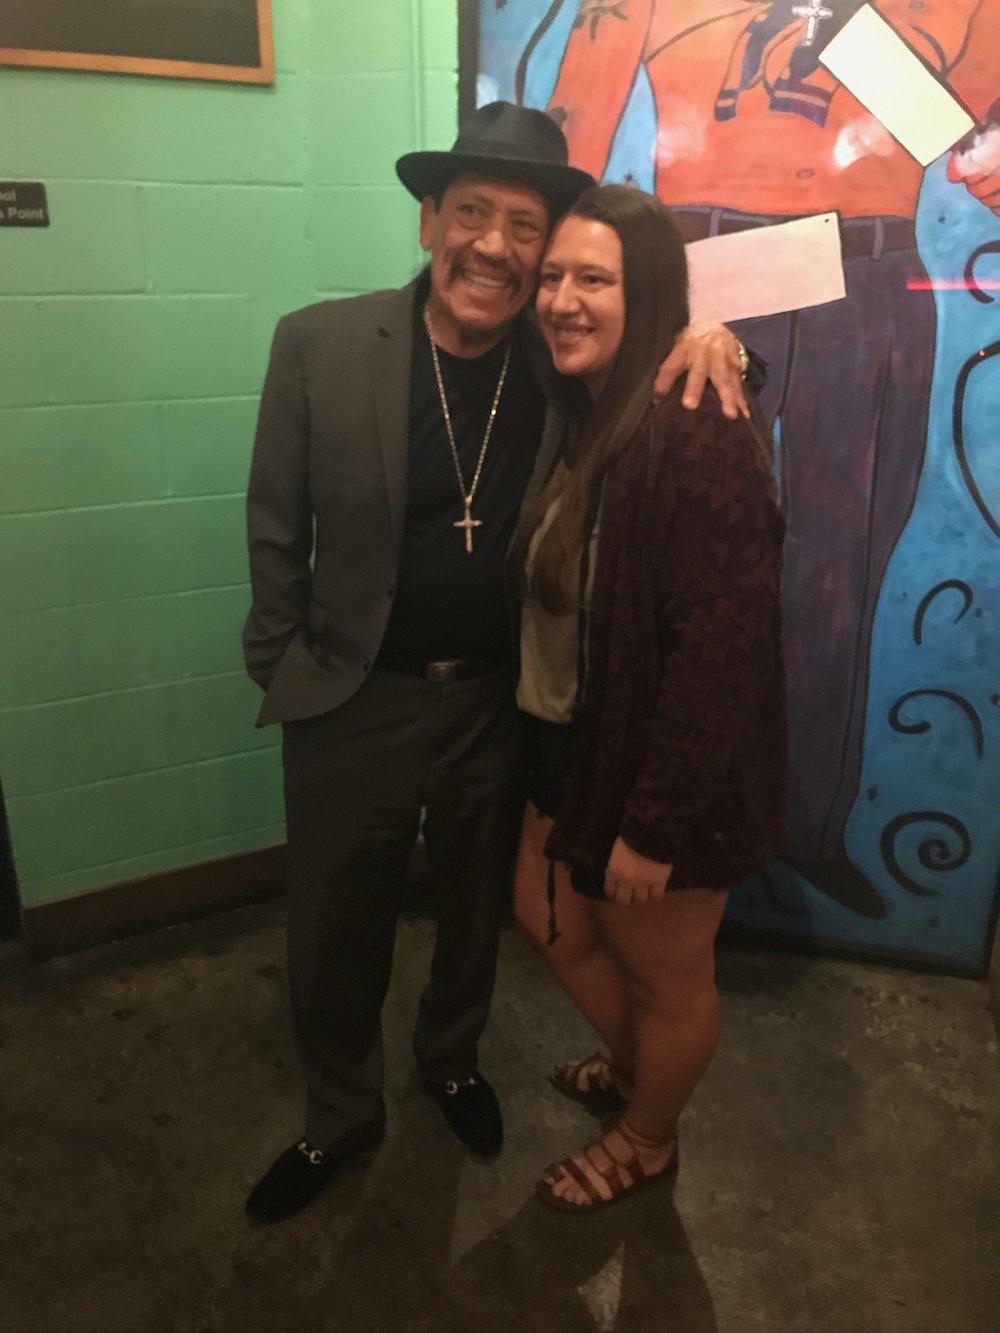 Mandy and Danny Trejo at Trejo's Cantina